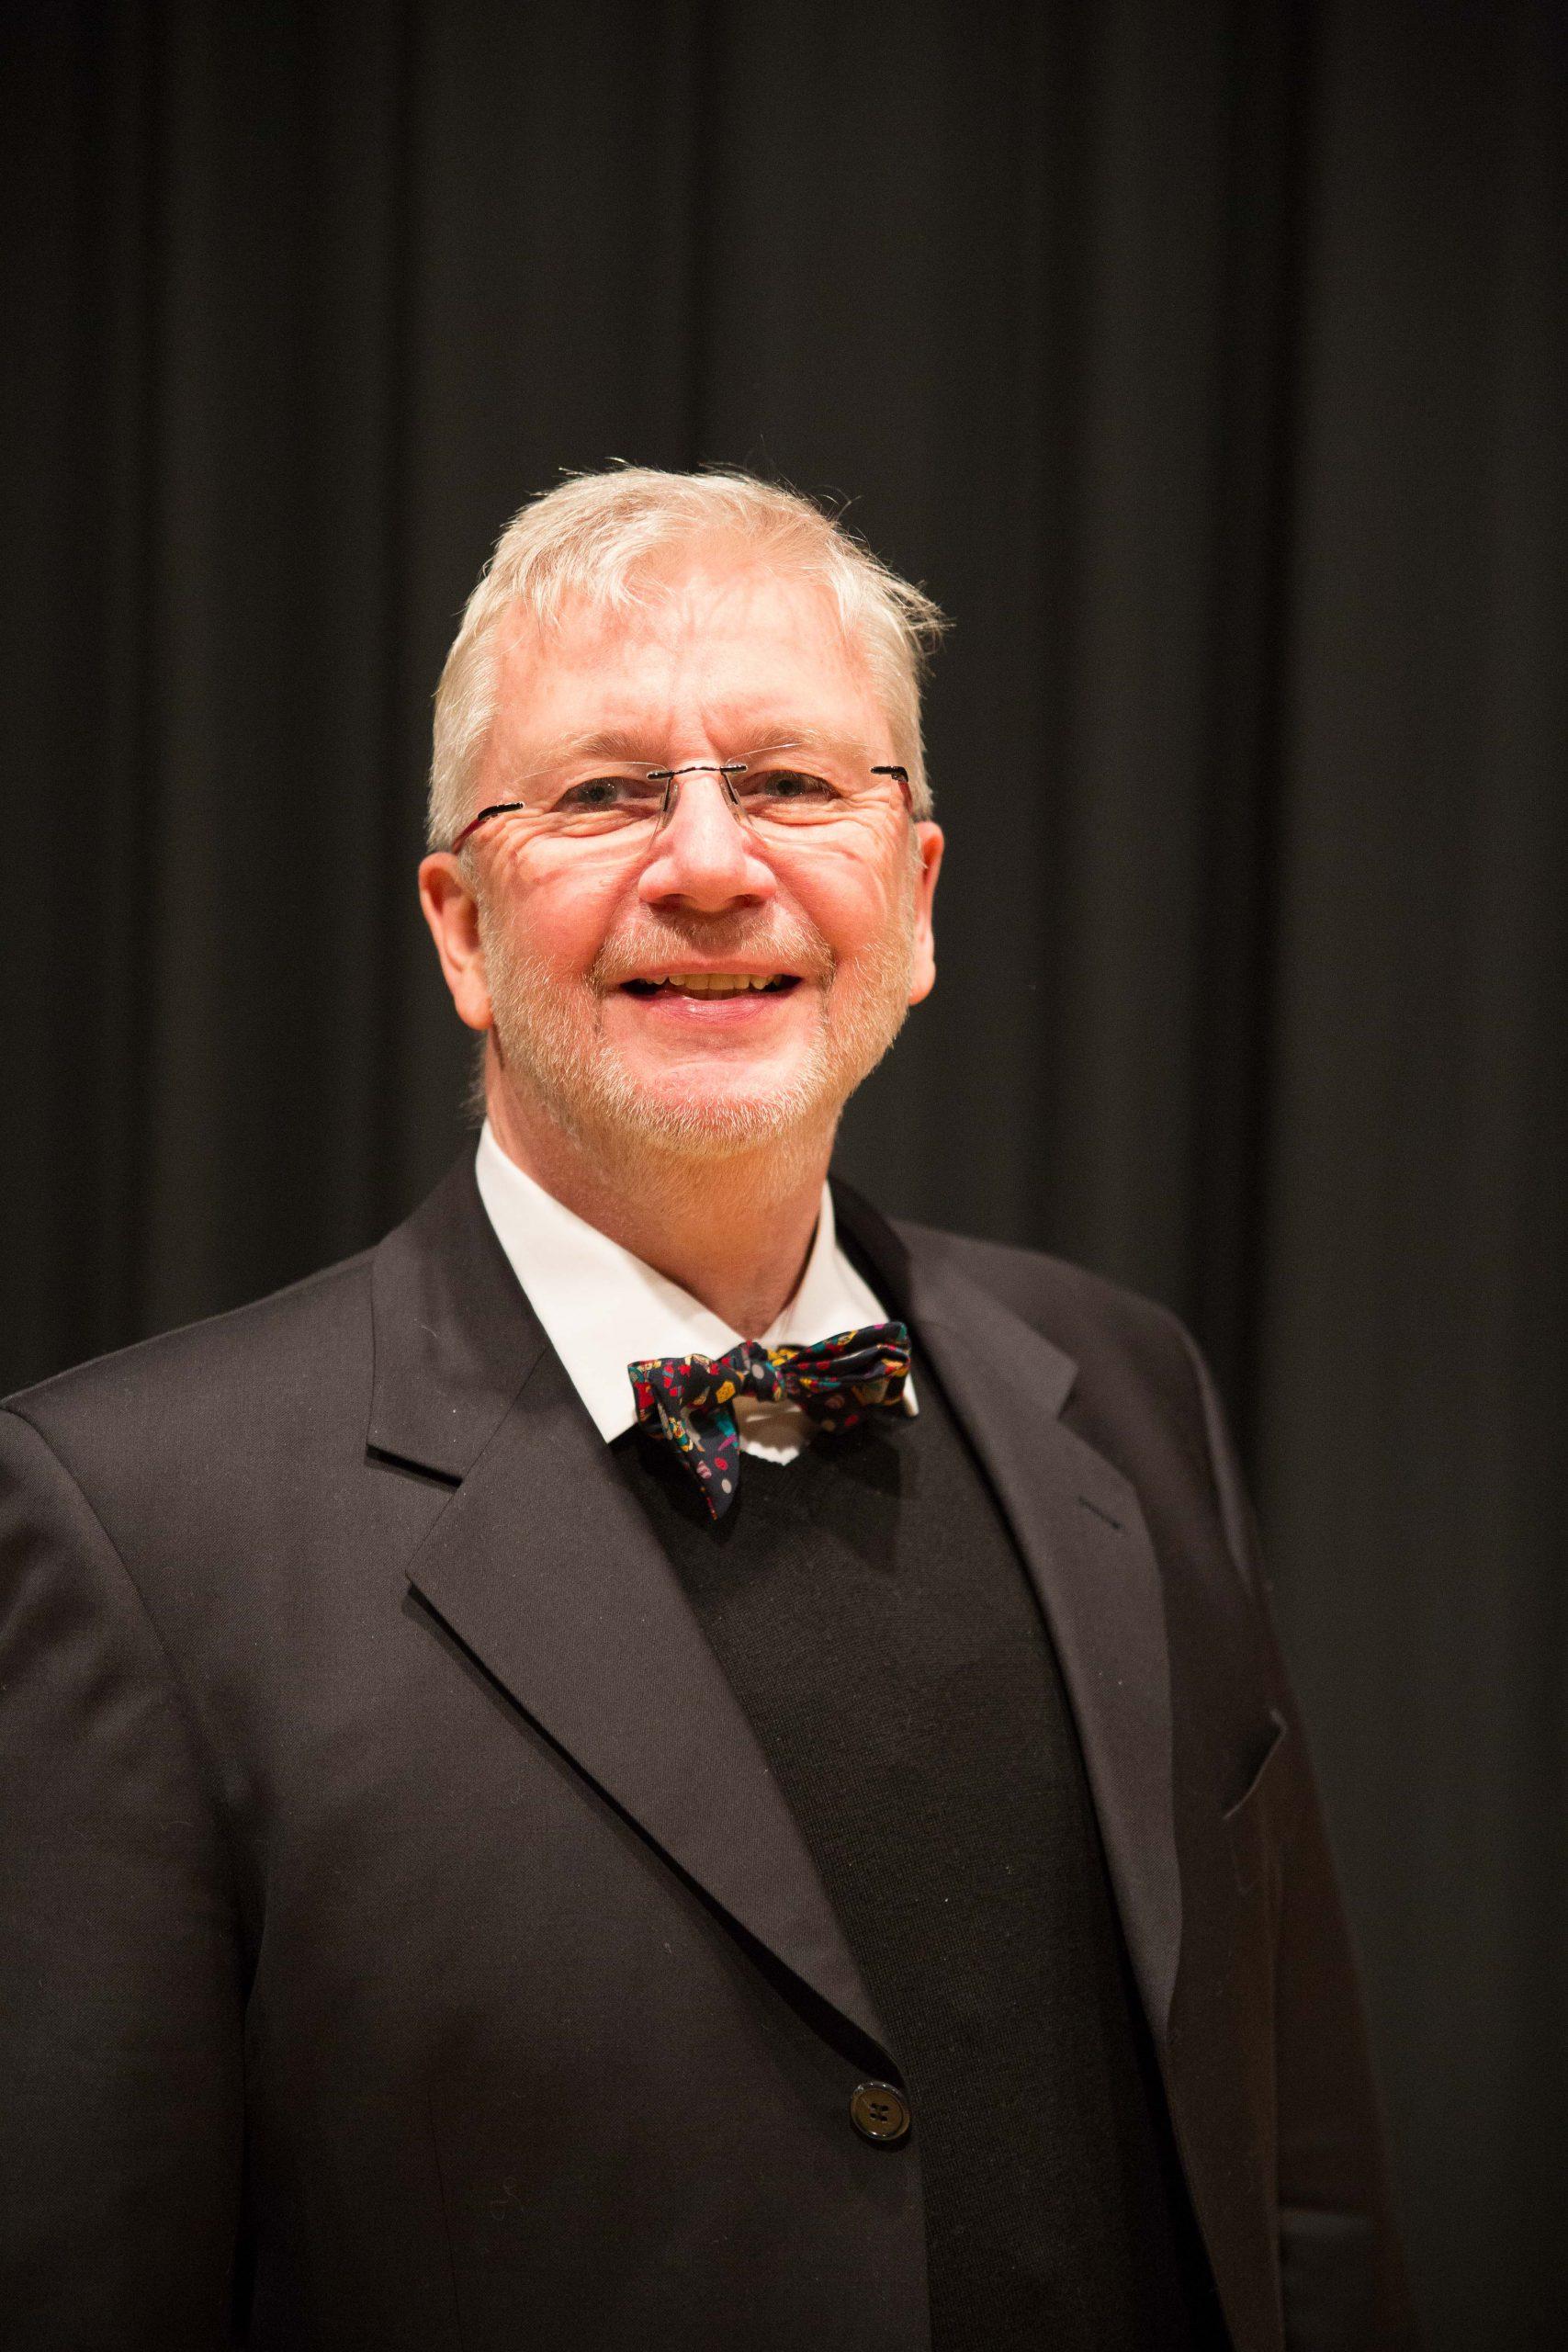 Horst Fuchs